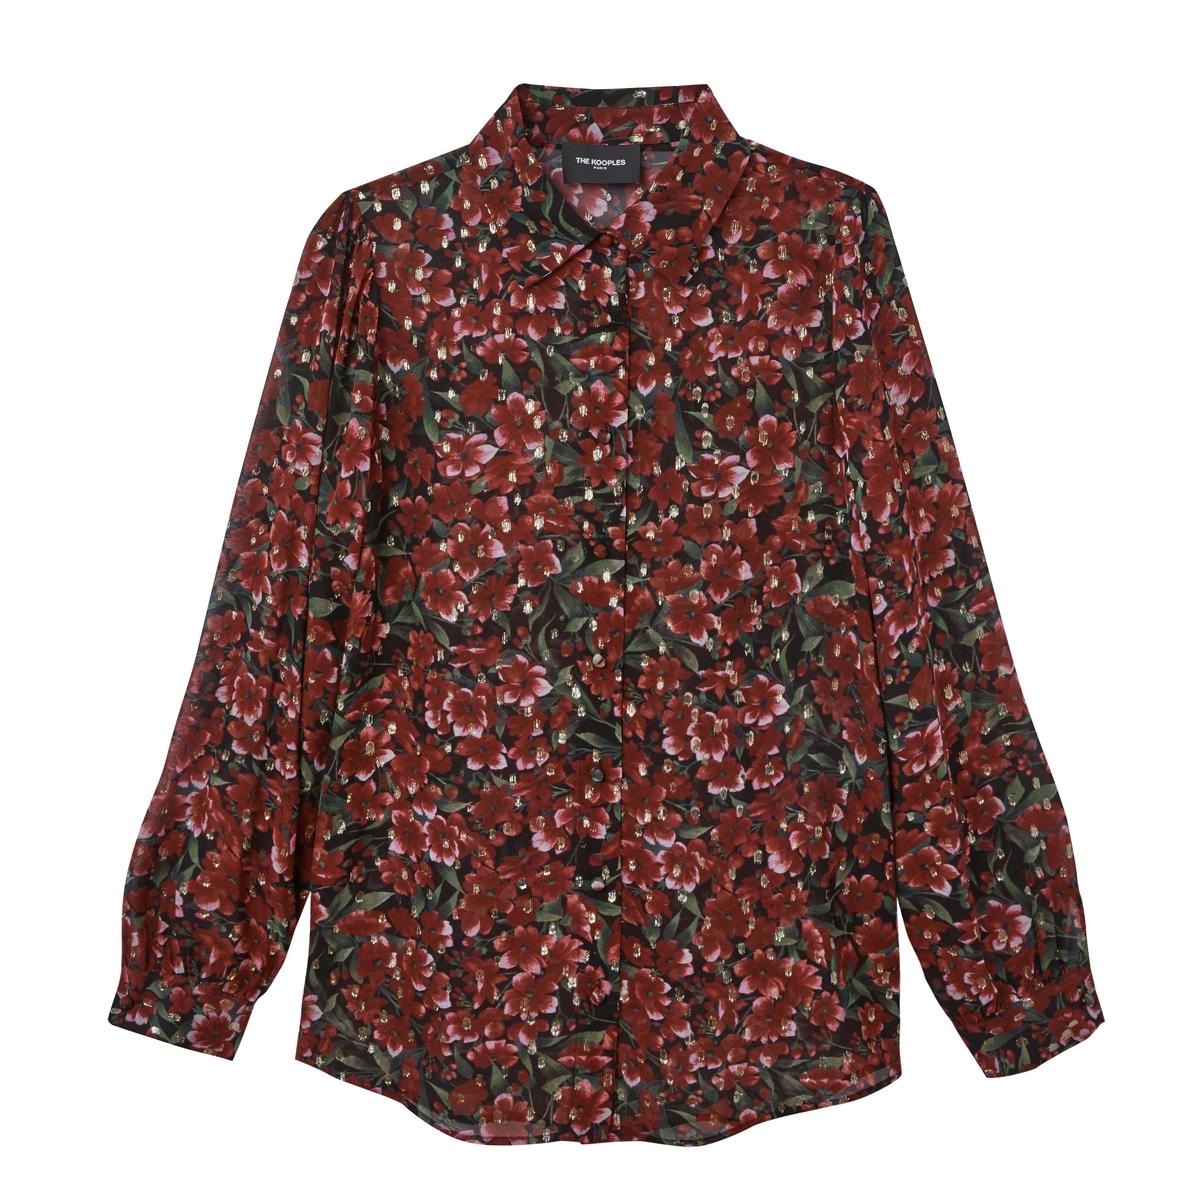 Camisa estampada irisada de manga larga